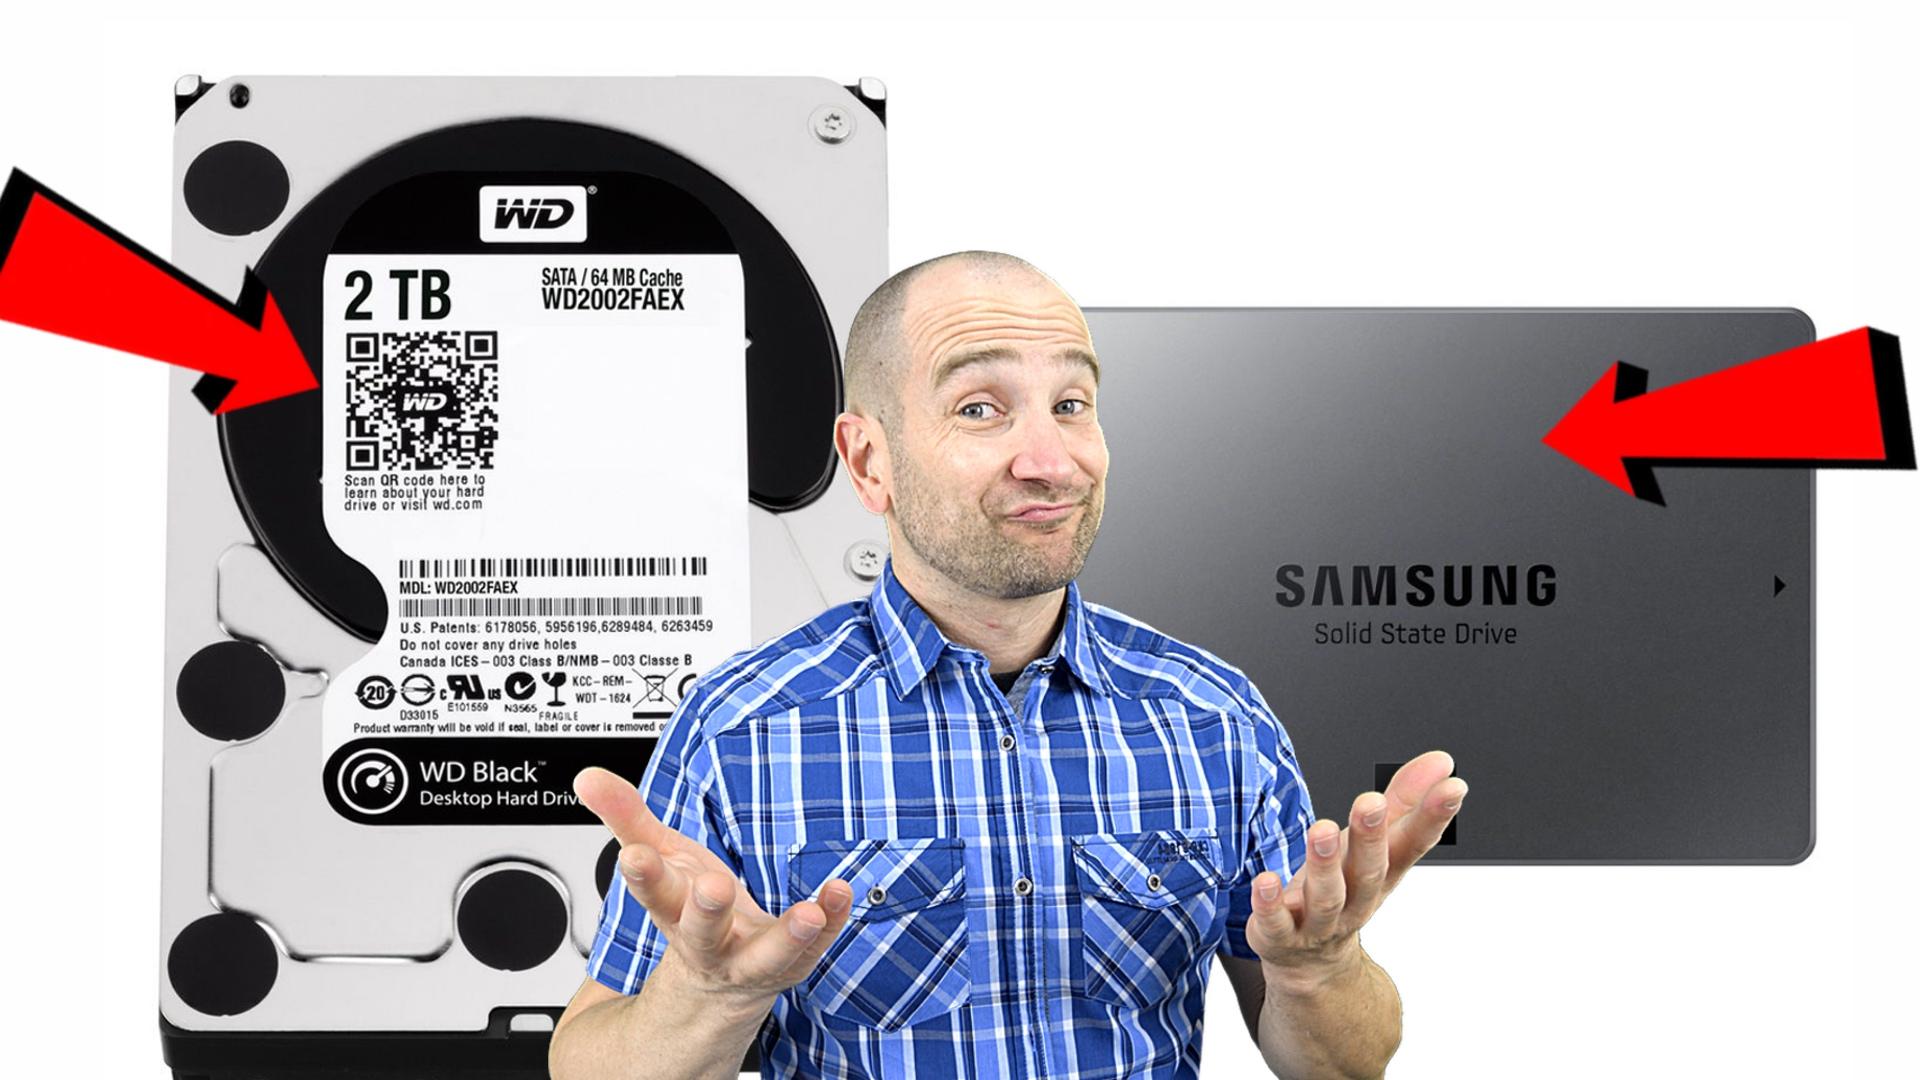 SSD vs Fusion Drive 2019 imac